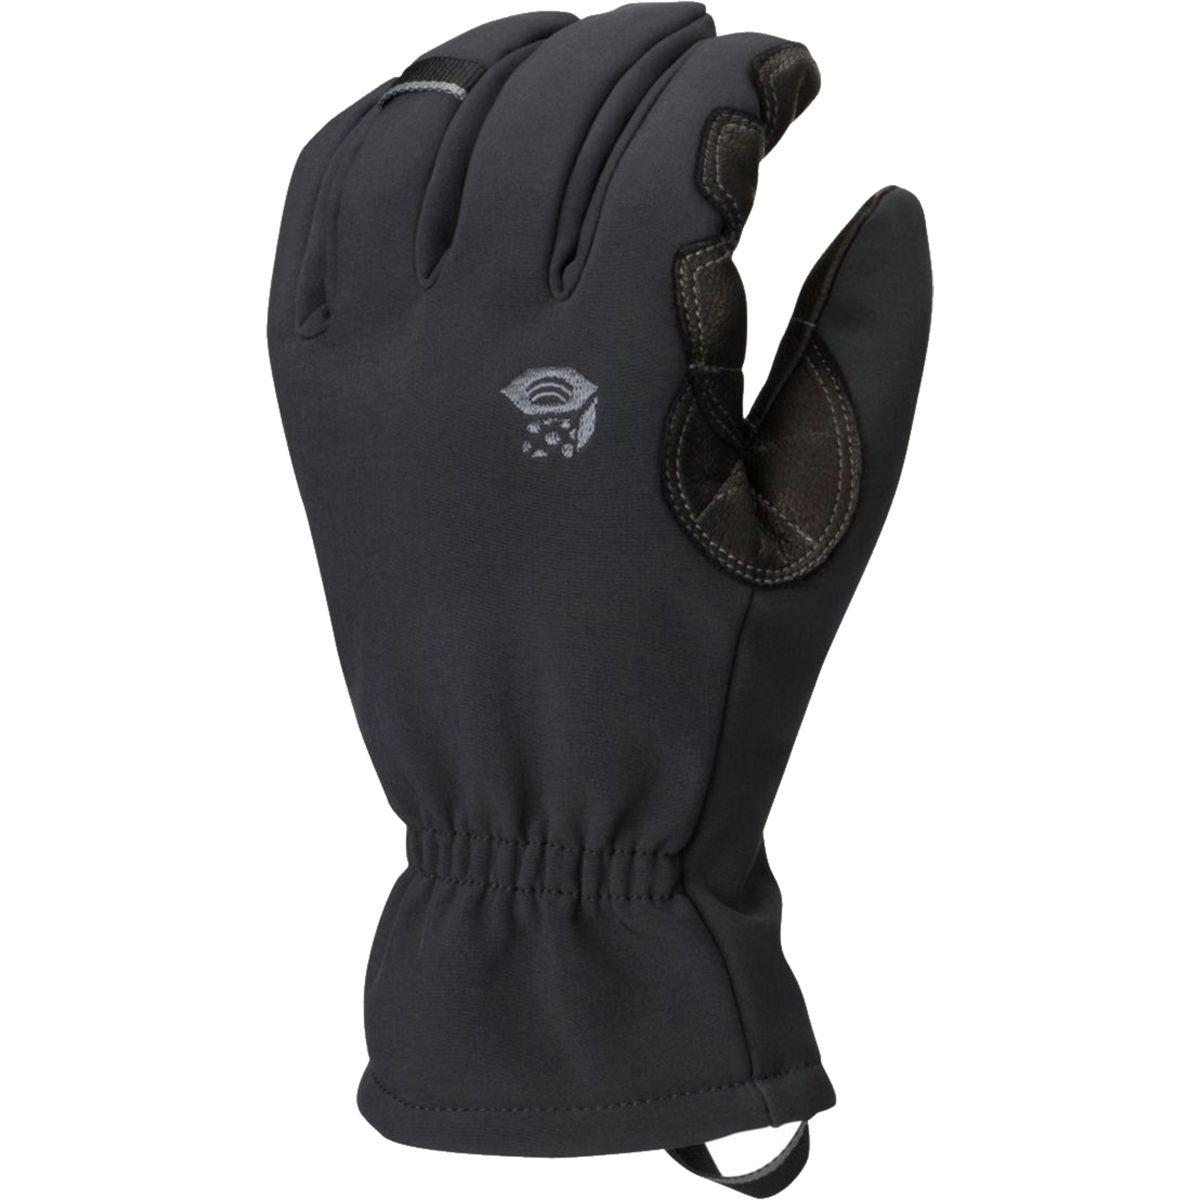 Mountain Hardwear Torsion Insulated Glove In Black Lyst